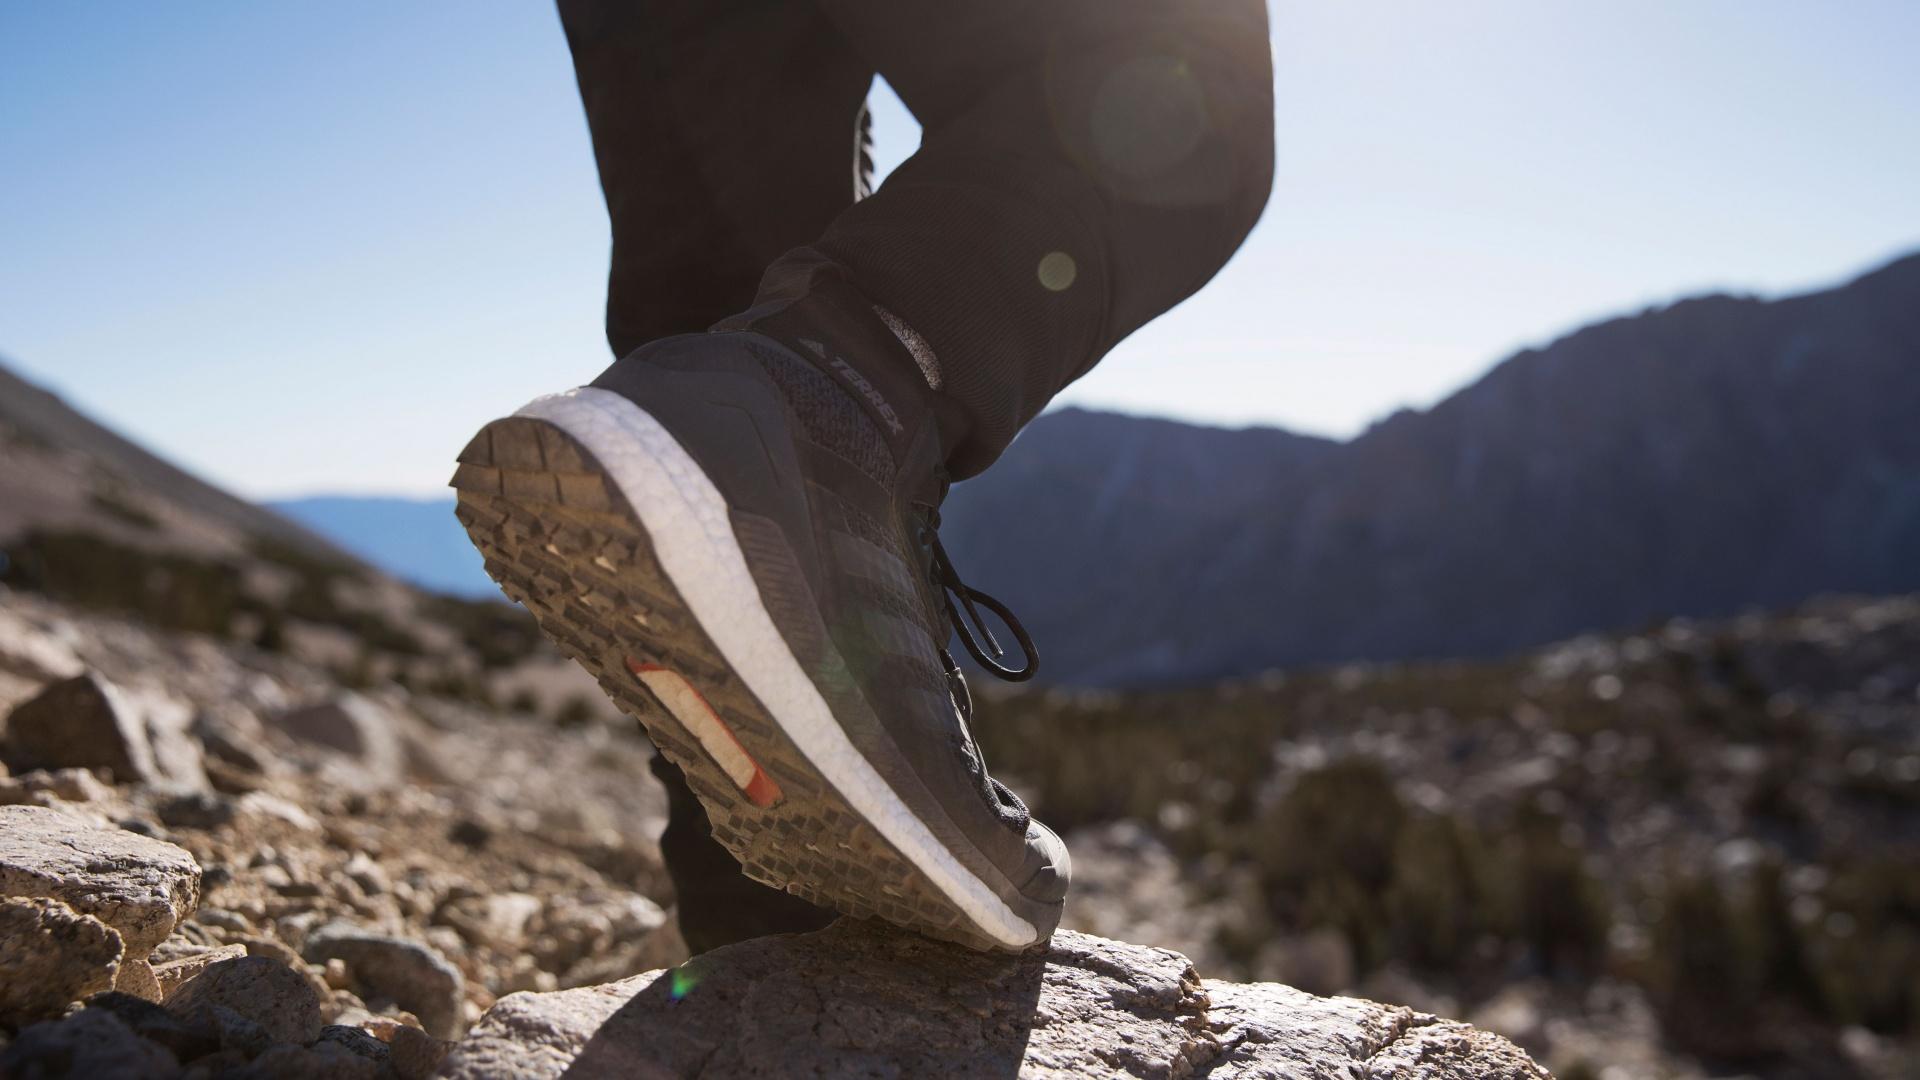 Adidas BootGear Magazine Free ReviewEscapism Hiker QCBWexrdo